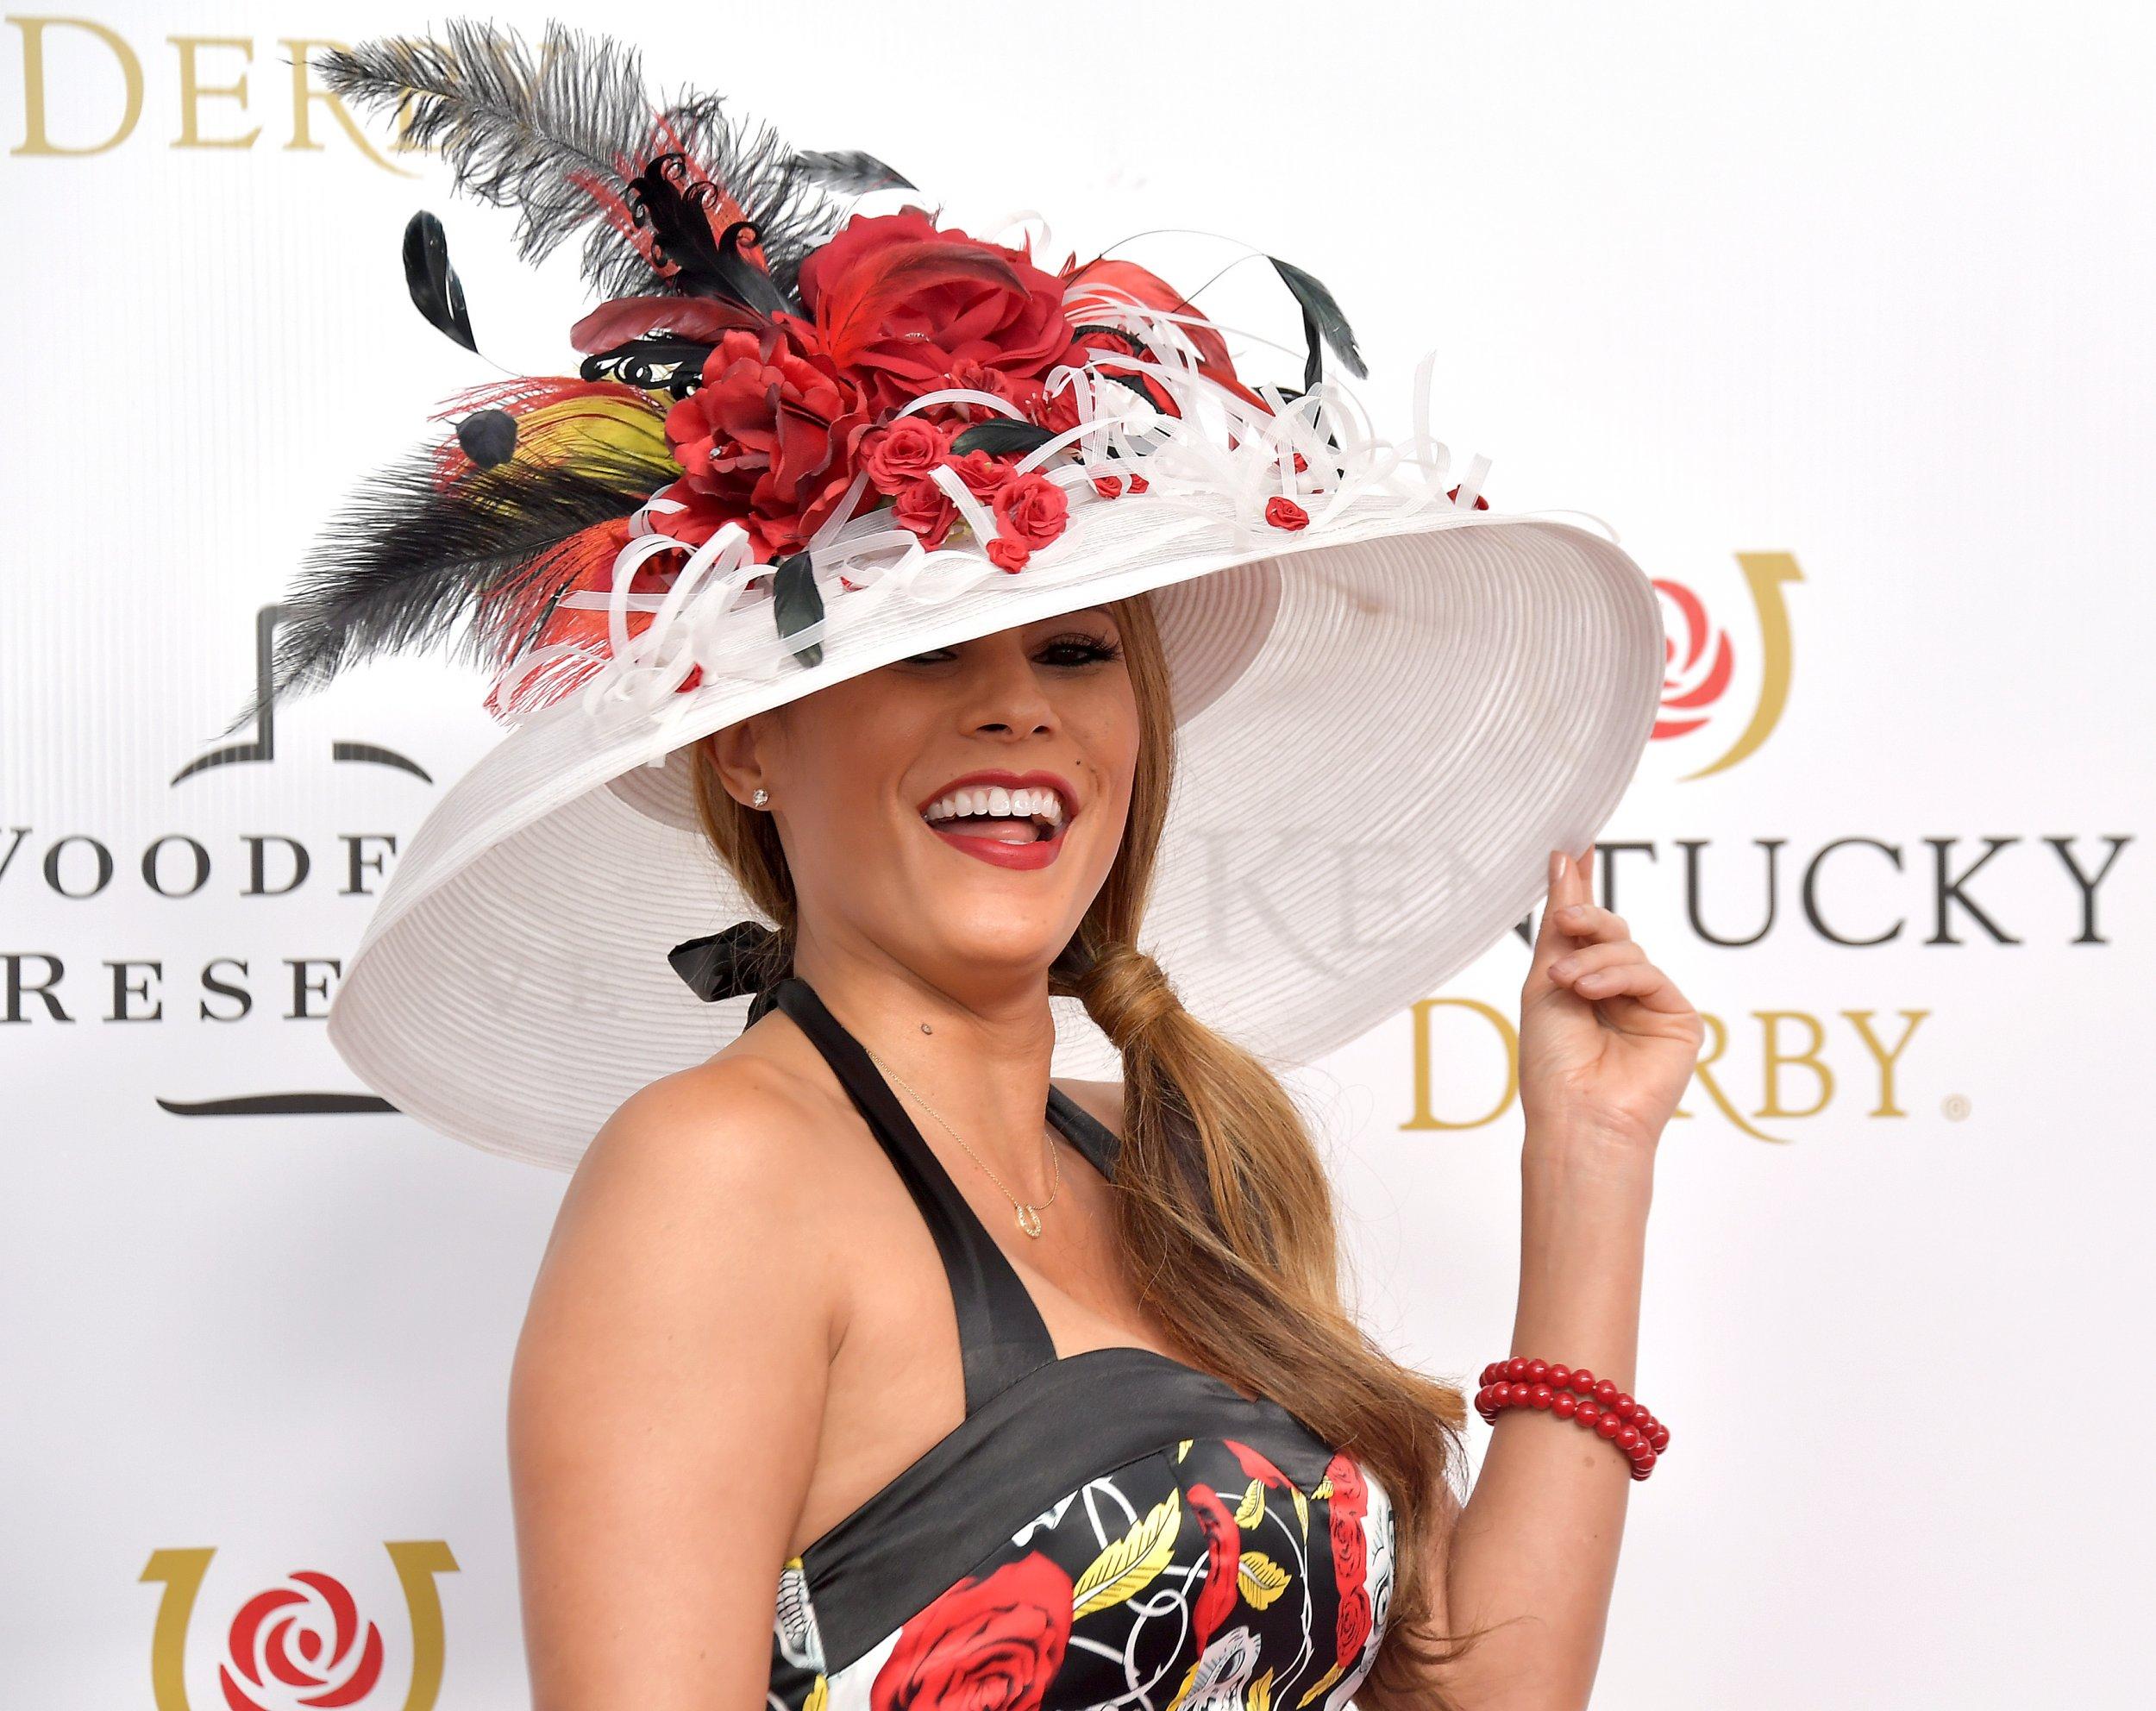 8c7ecd8381c3b Kentucky Derby 2019  See Red Carpet Celebrity Photos